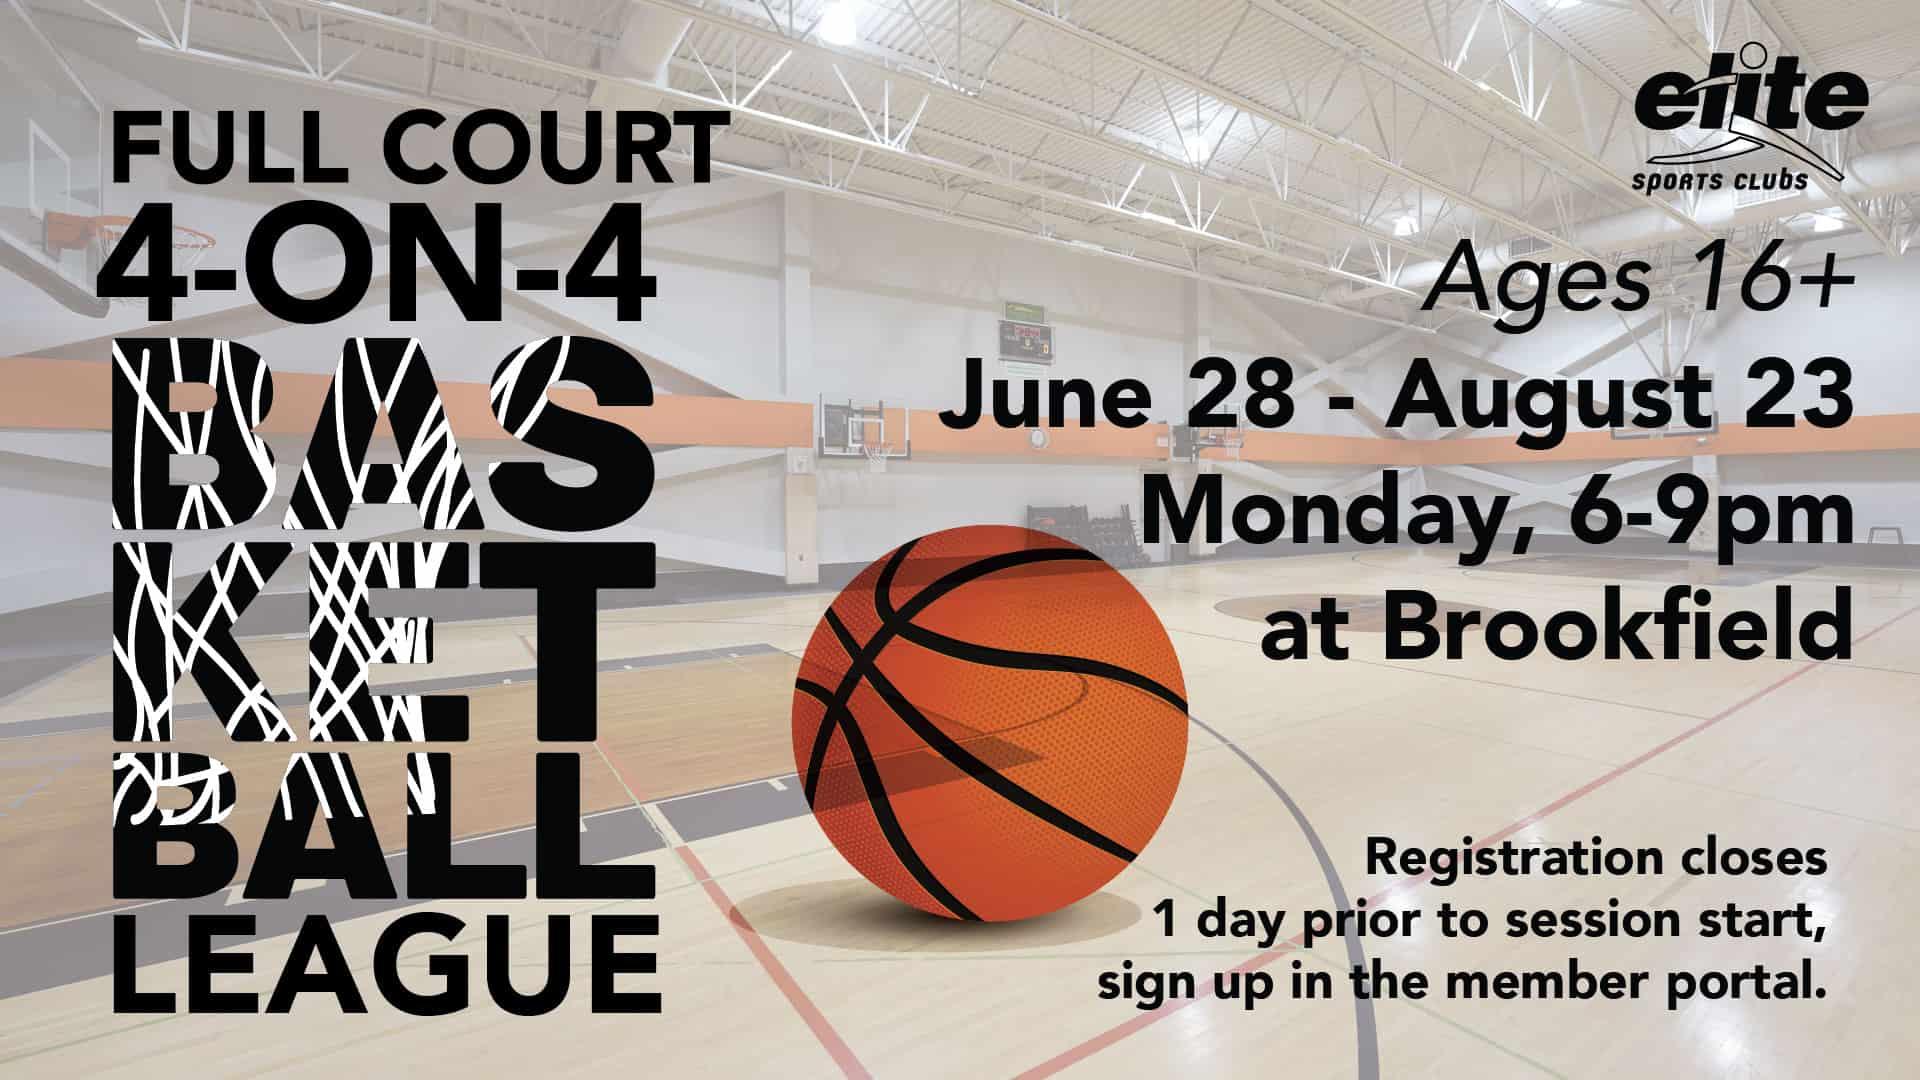 Full Court 4-on-4 Basketball League - Elite Brookfield - Summer 2021